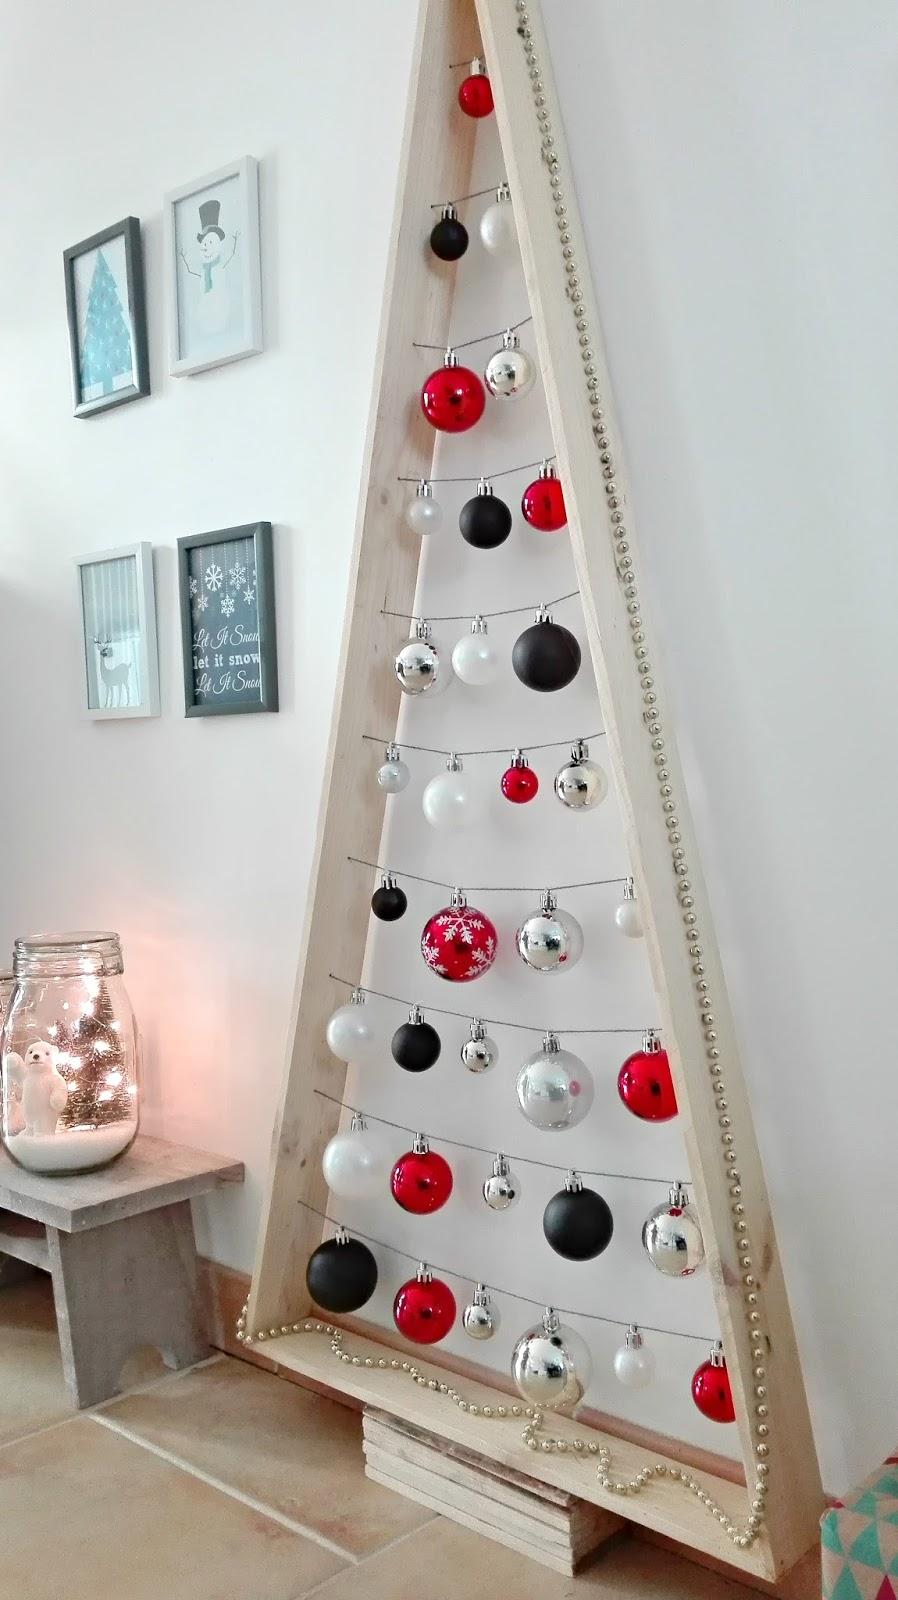 d coration de no l sapin design minimaliste truc. Black Bedroom Furniture Sets. Home Design Ideas